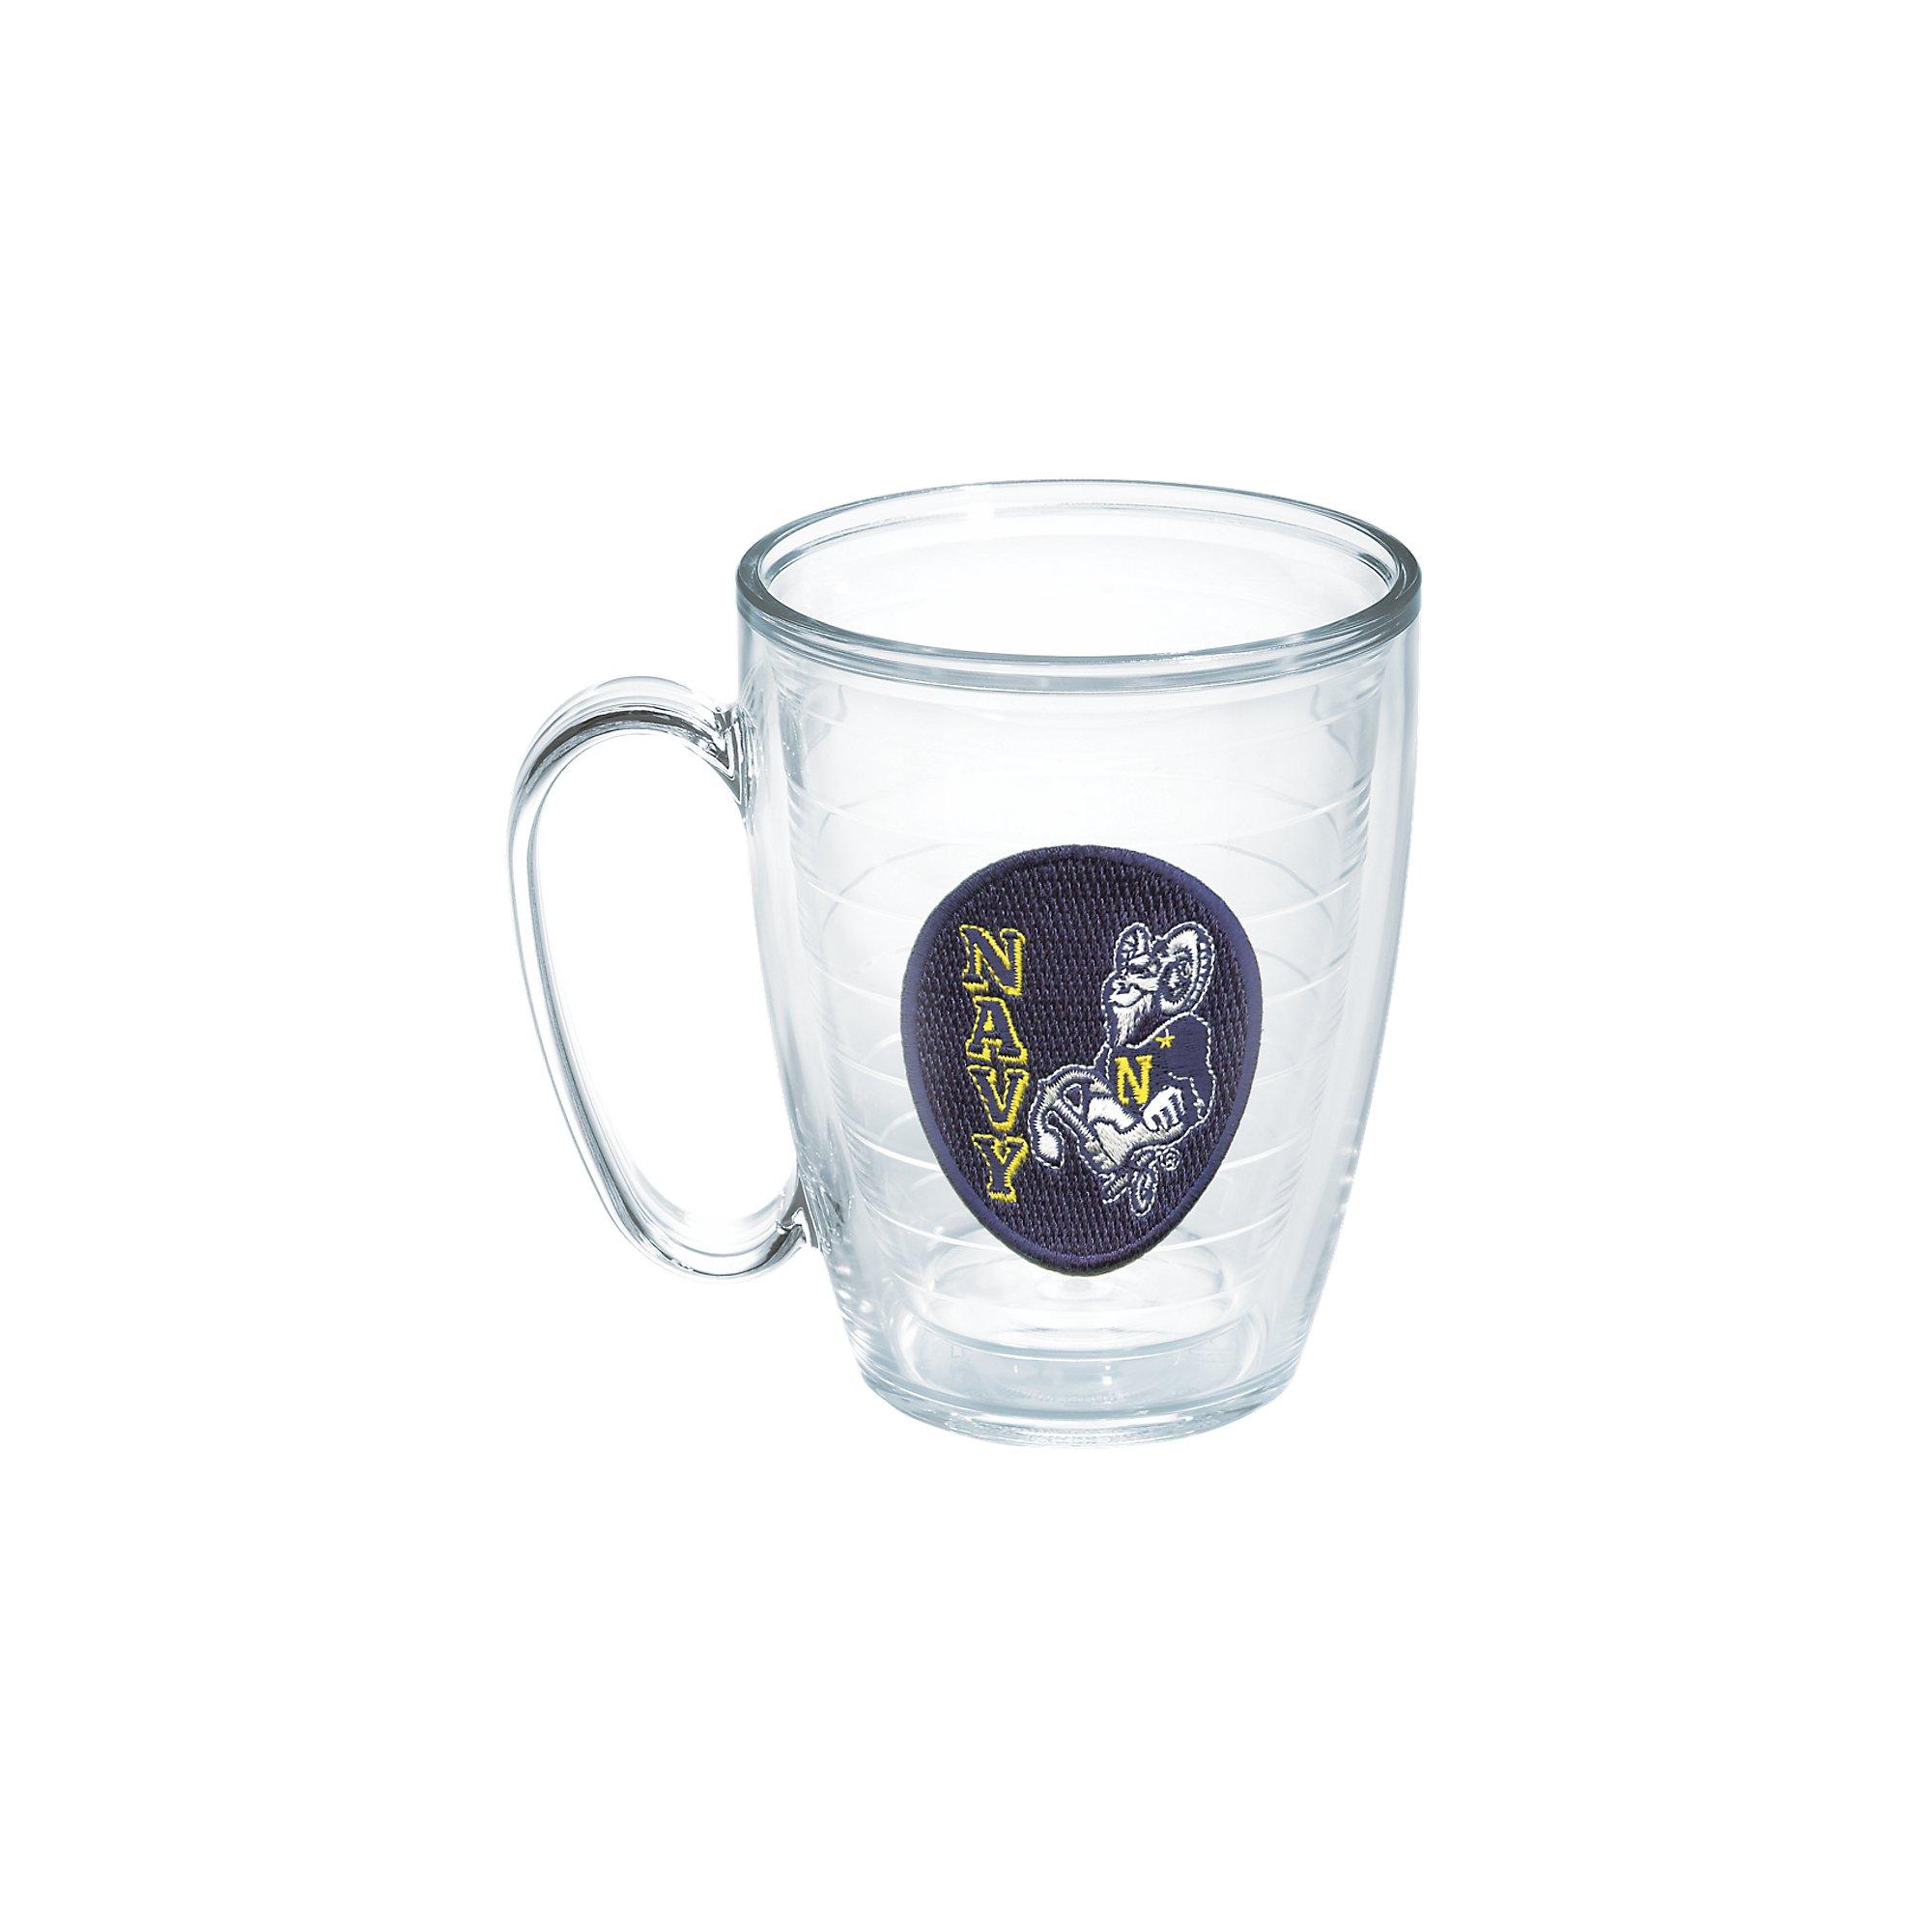 Tervis US Naval Academy Seal Emblem Individual Mug, 16 oz, Clear